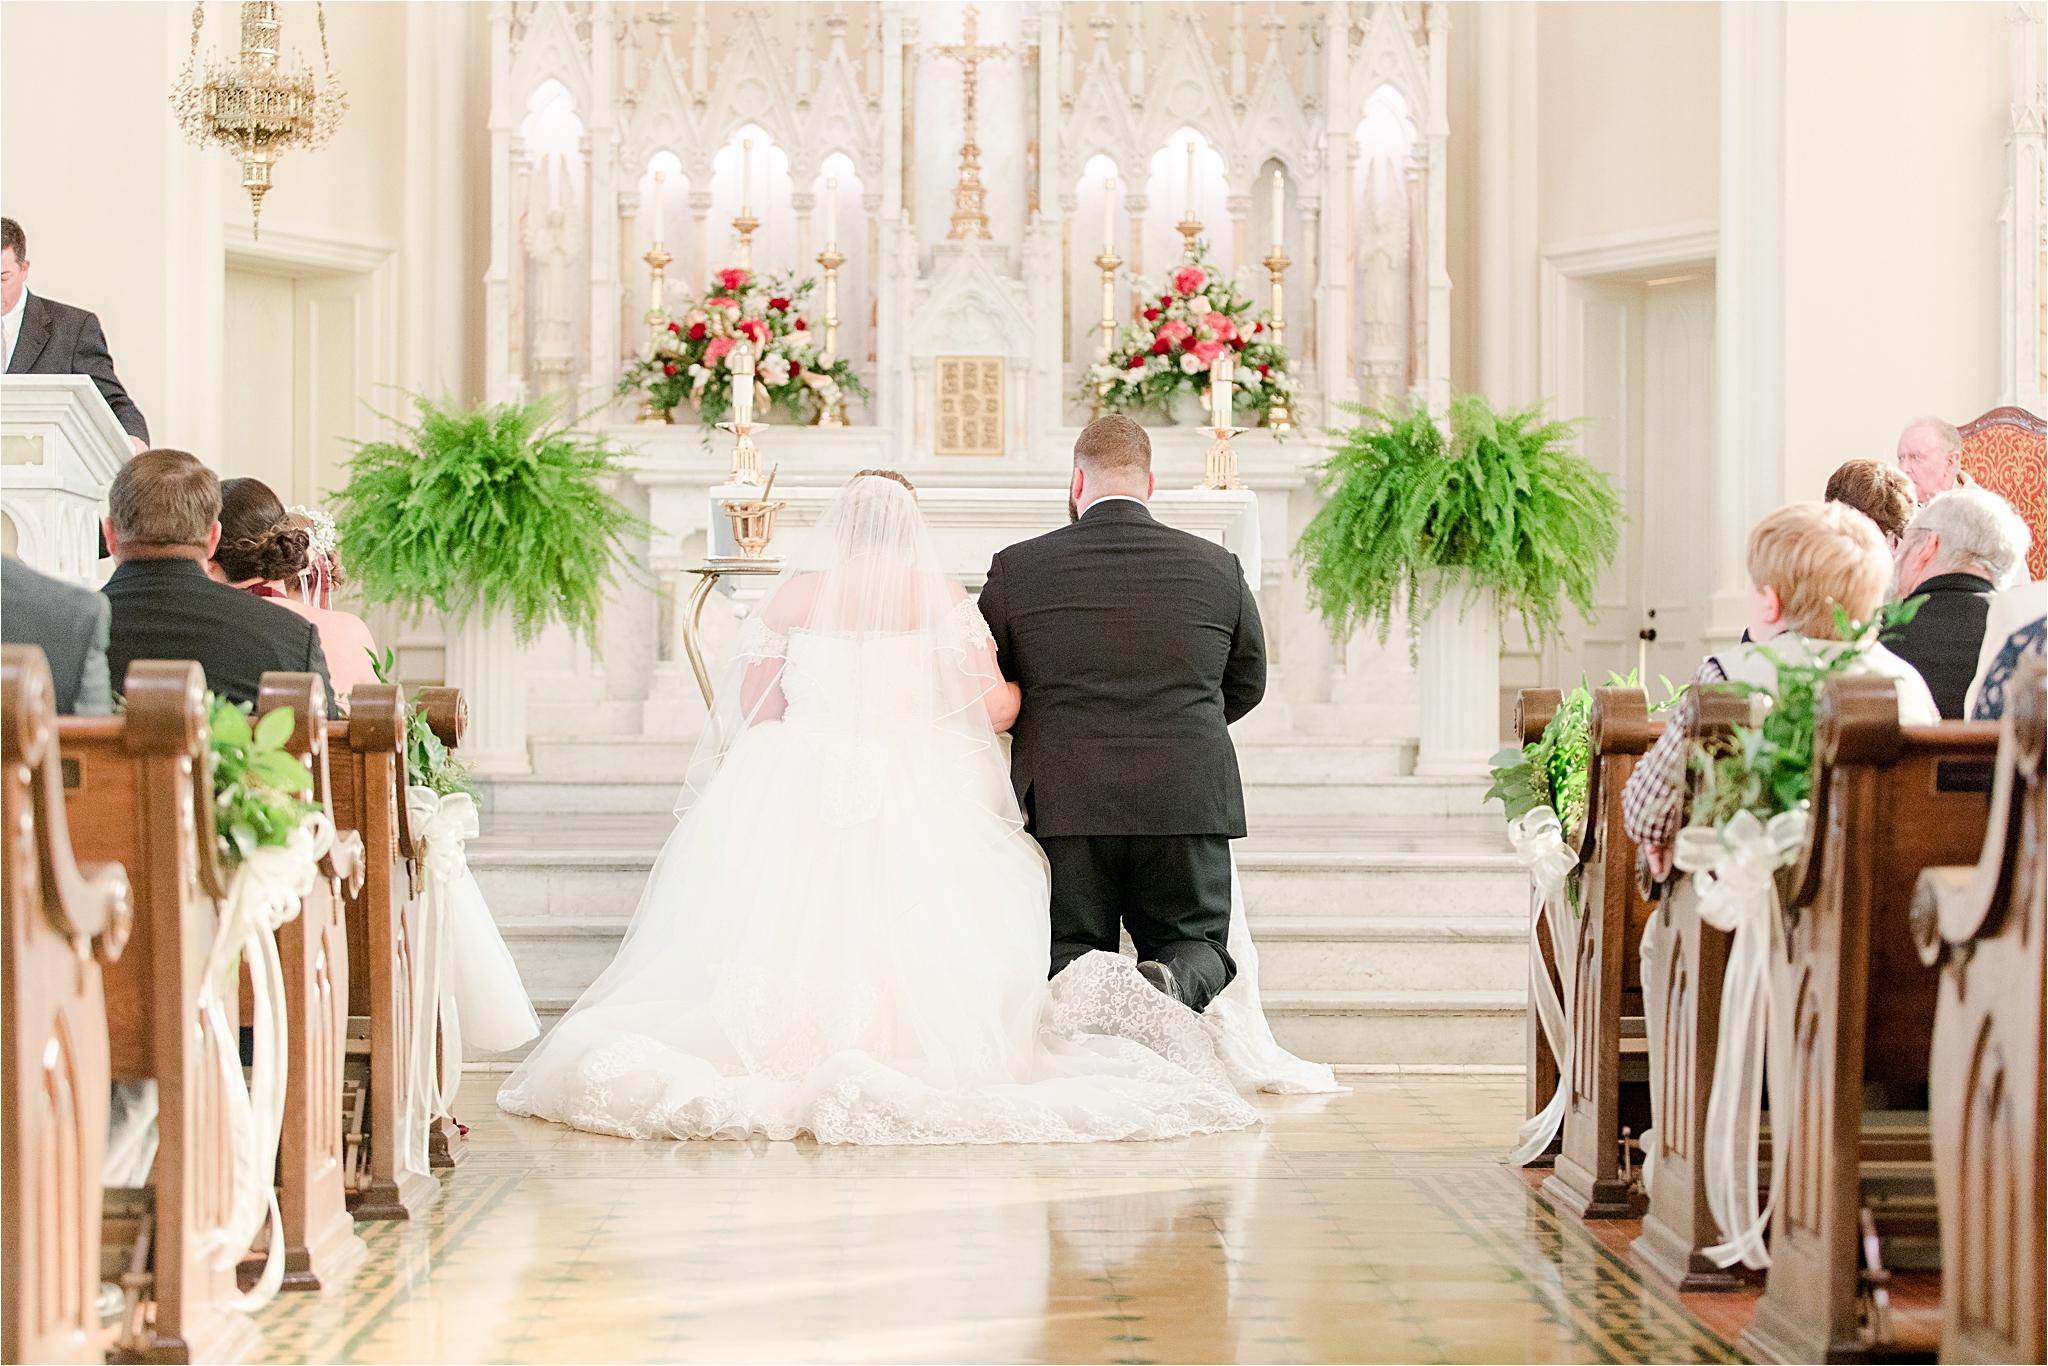 catholic-wedding-ceremony-prayer-bride and groom-christmas-wedding